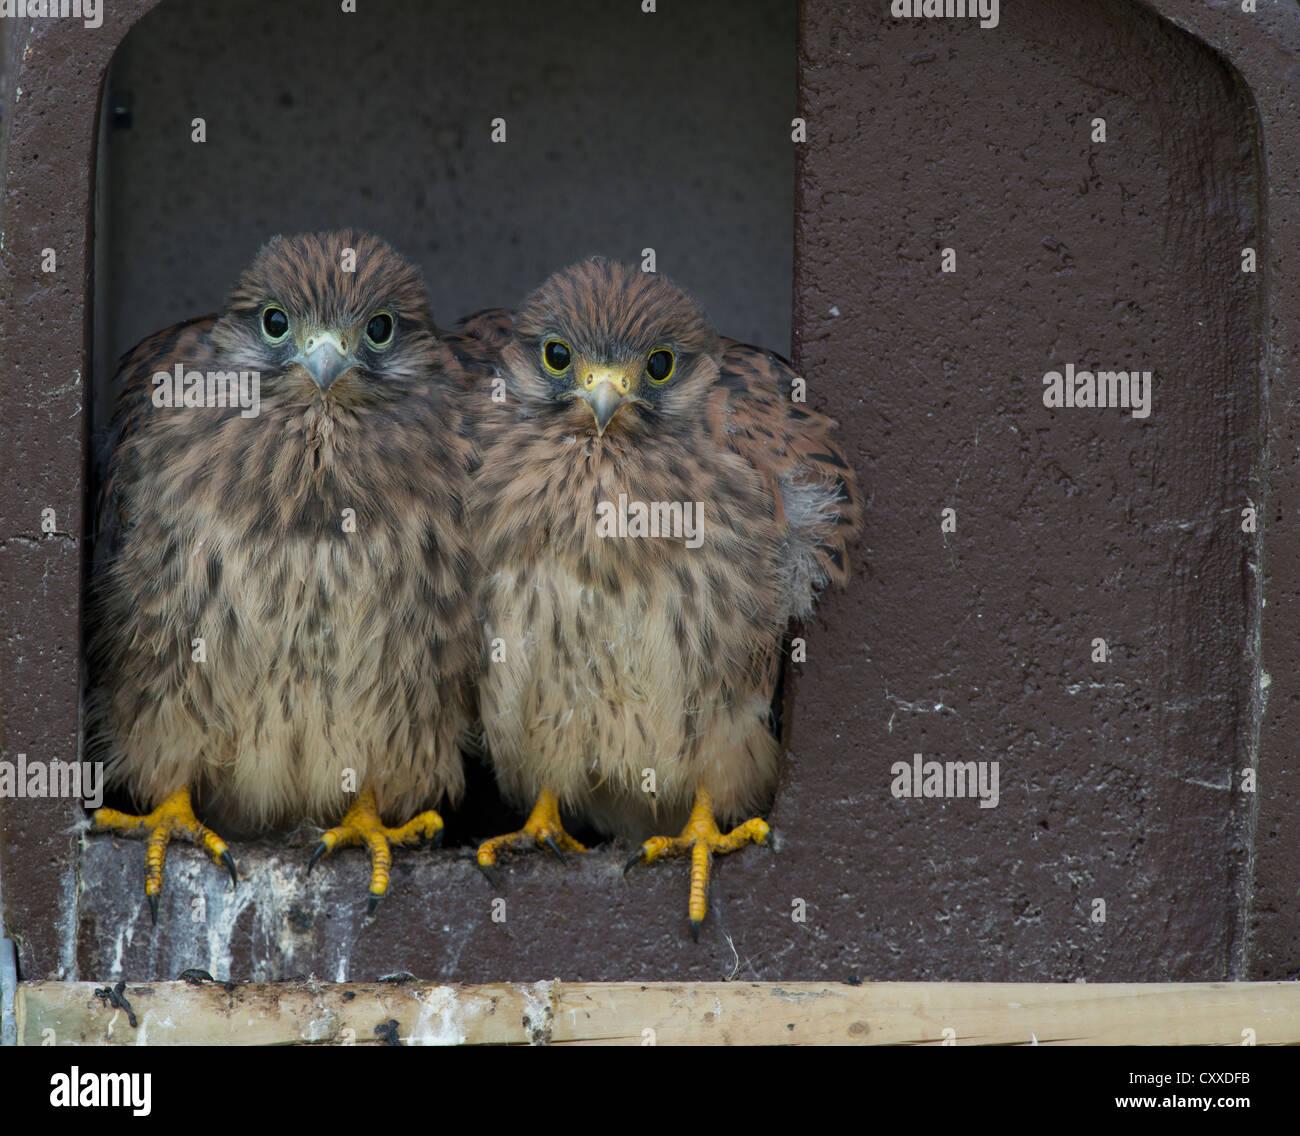 Common Kestrels (Falco tinnunculus), Bitburg, Rhineland-Palatinate - Stock Image